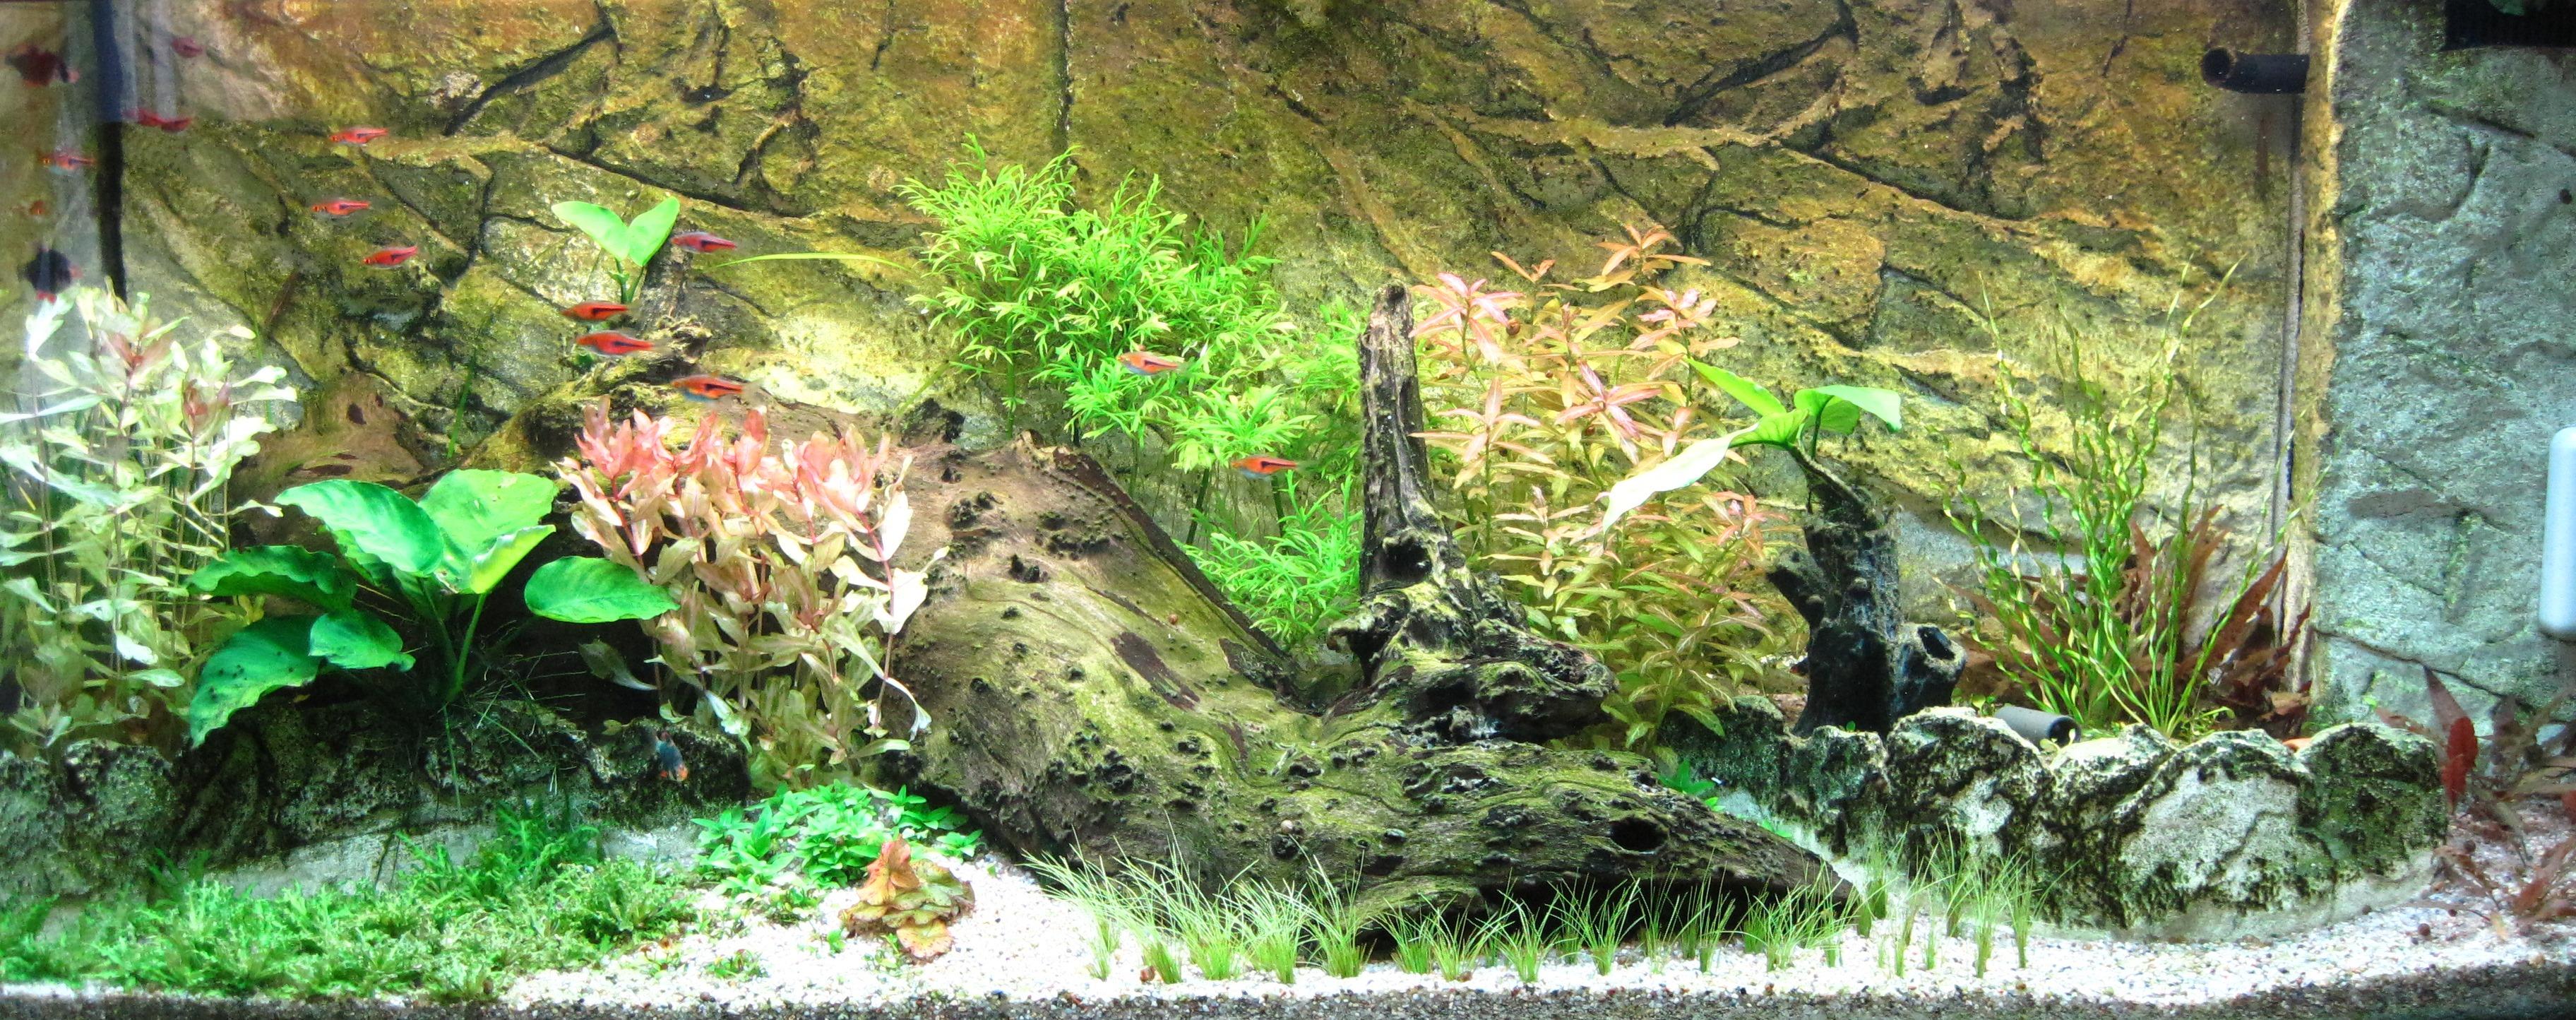 einrichtung eines aquariums hardscape aquarium welt. Black Bedroom Furniture Sets. Home Design Ideas